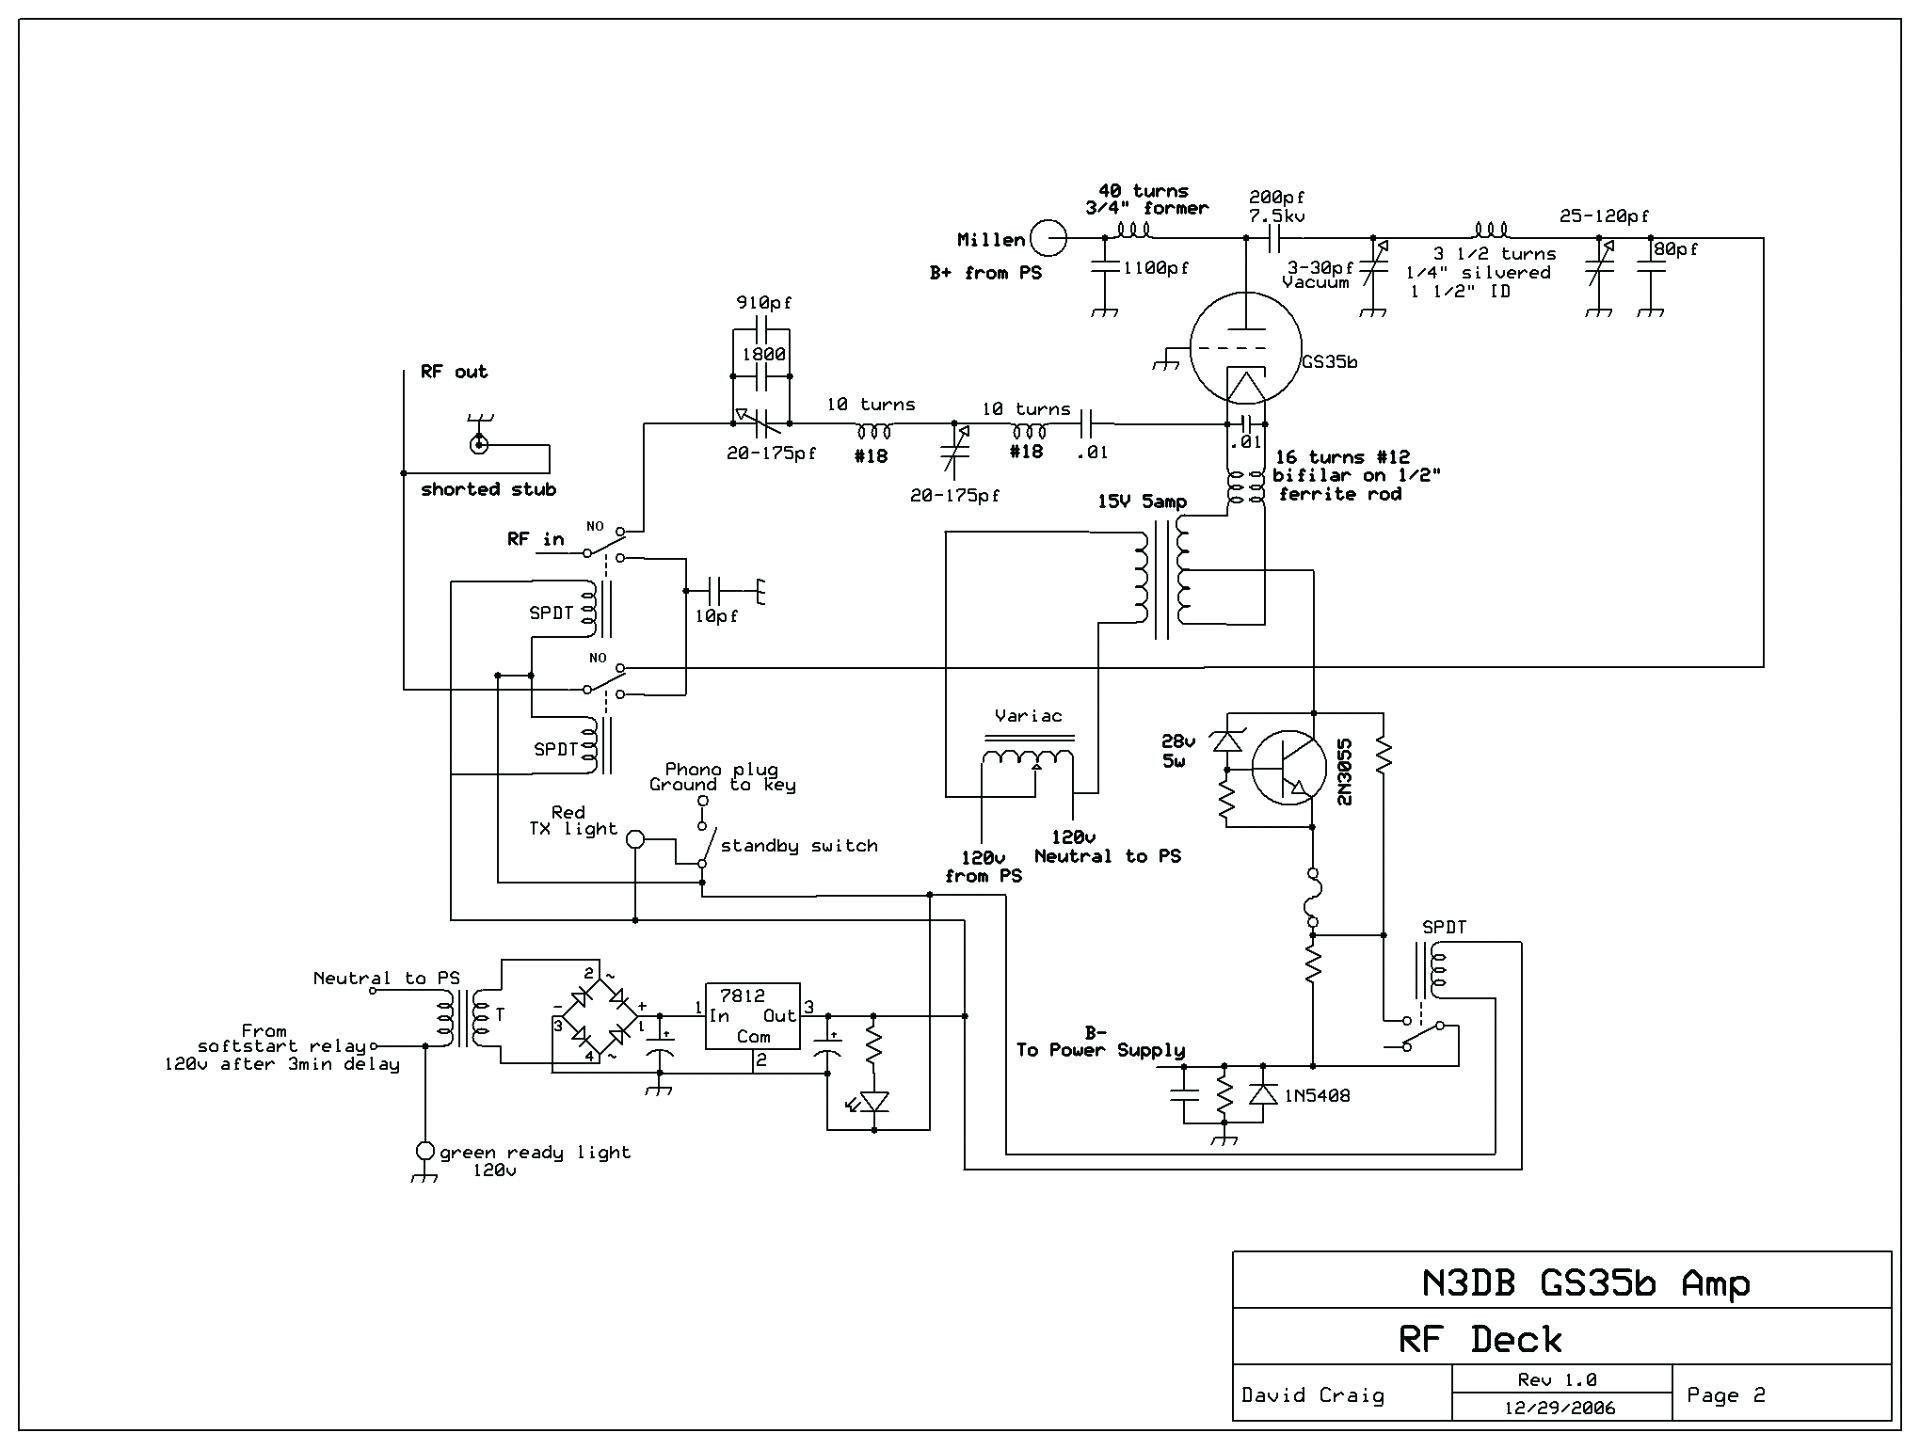 22011 gould contactor wiring diagram gould motor wiring diagram gould motor wiring diagram | free wiring diagram #6